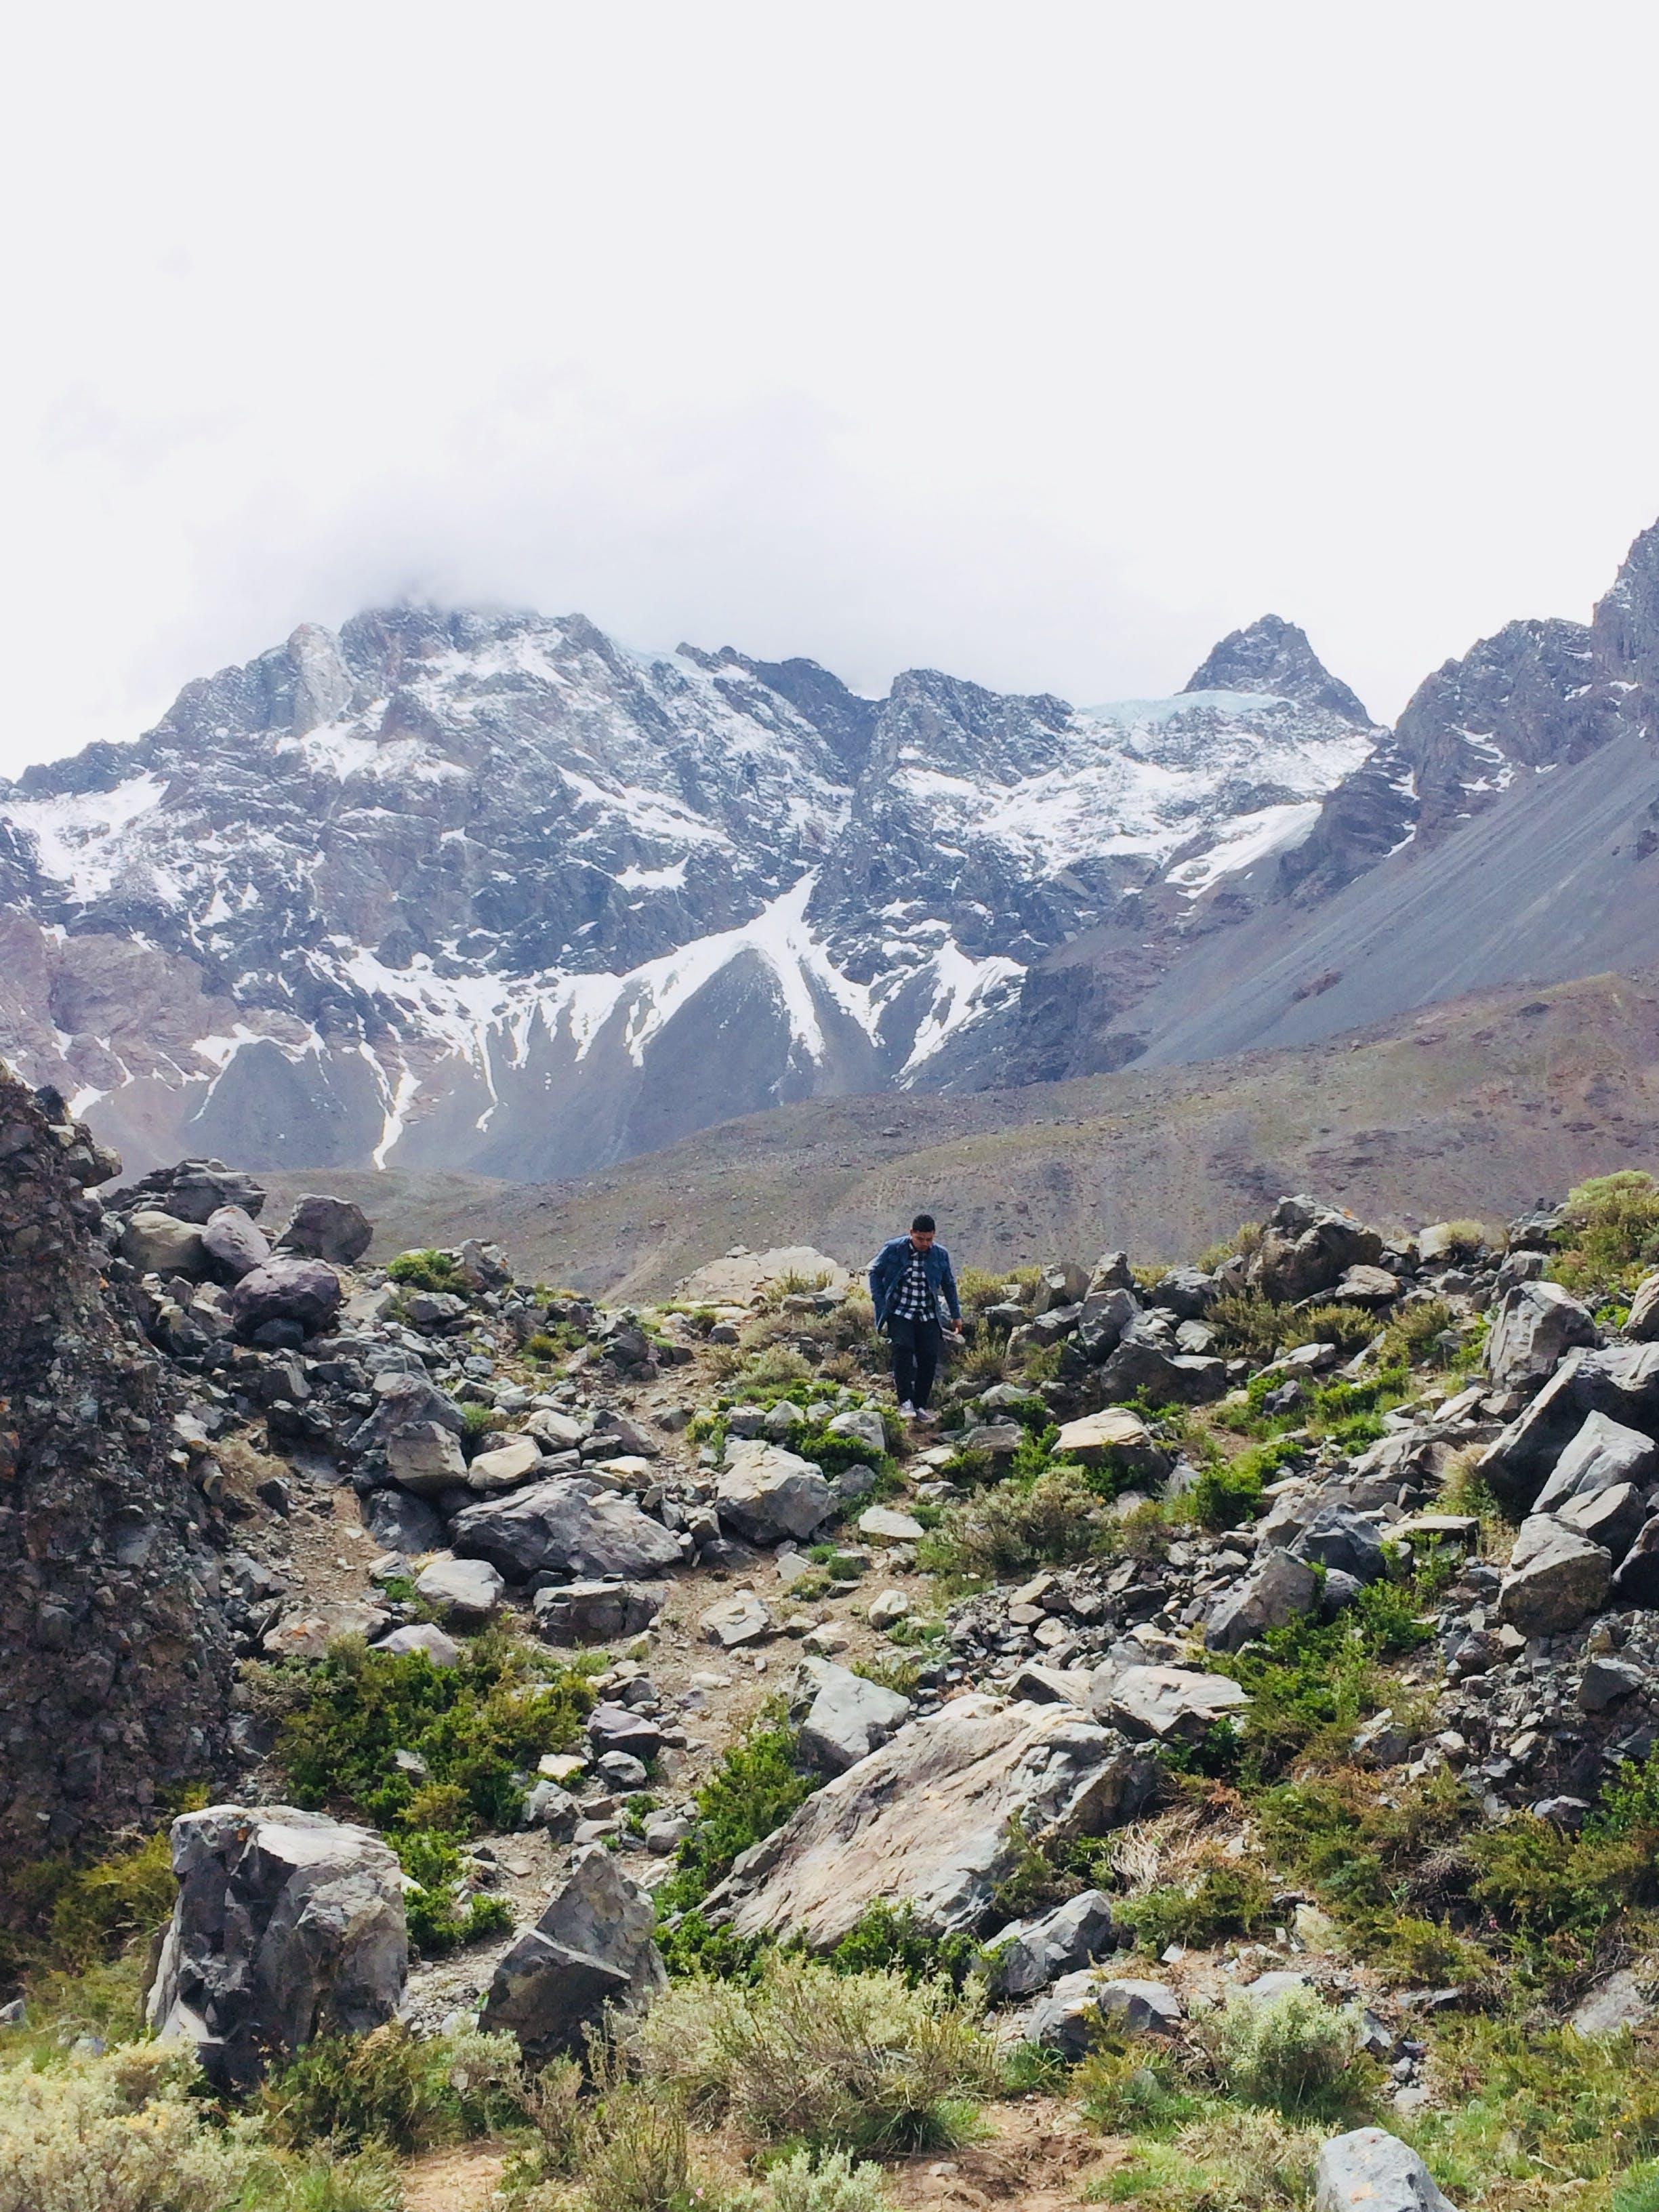 Kostenloses Stock Foto zu abenteuer, berge, berggipfel, bergsteigen